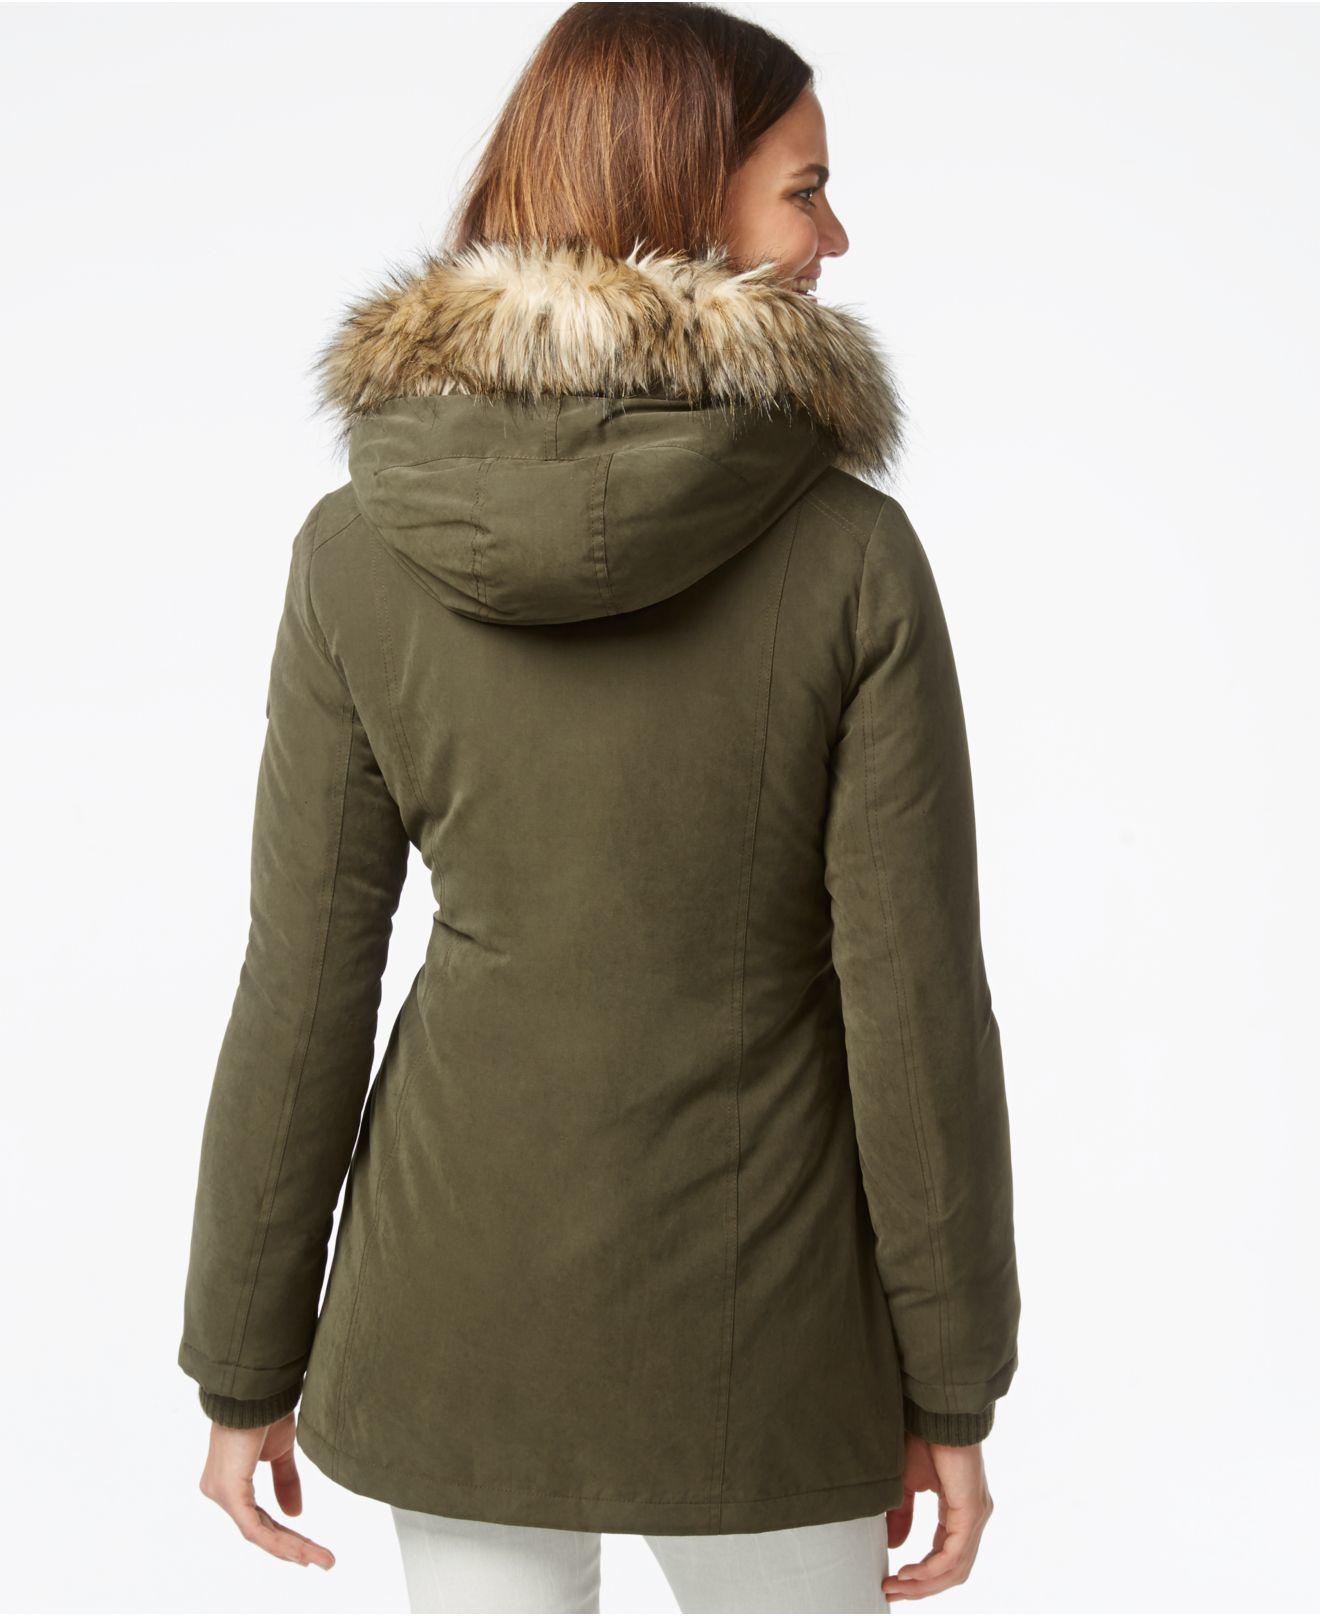 Lyst Dkny Faux Fur Trim Parka Jacket In Green